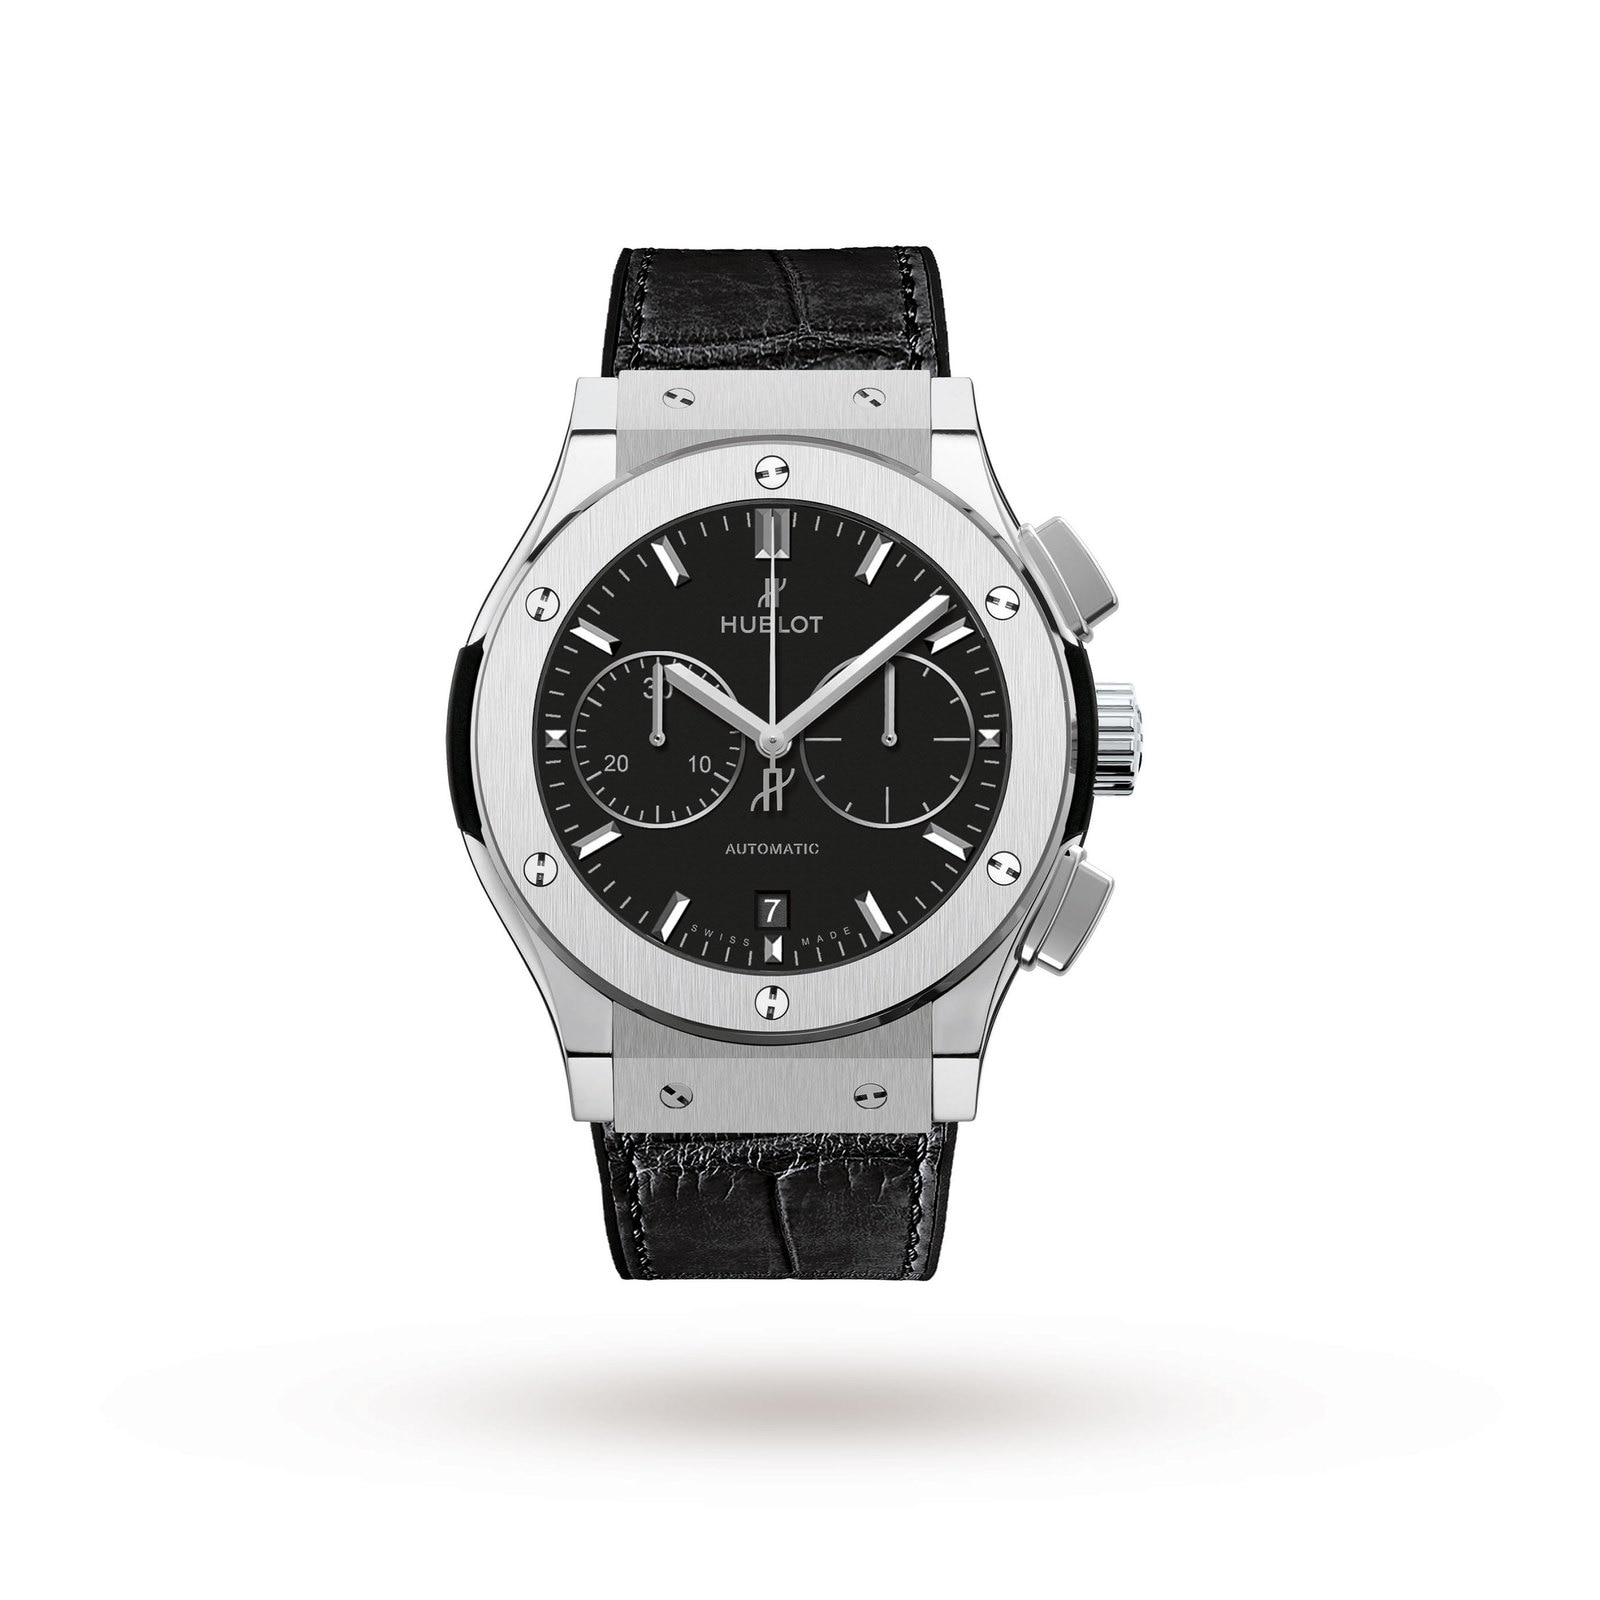 Hublot Hublot Classic Fusion Chronograph Titanium 45mm Mens Watch